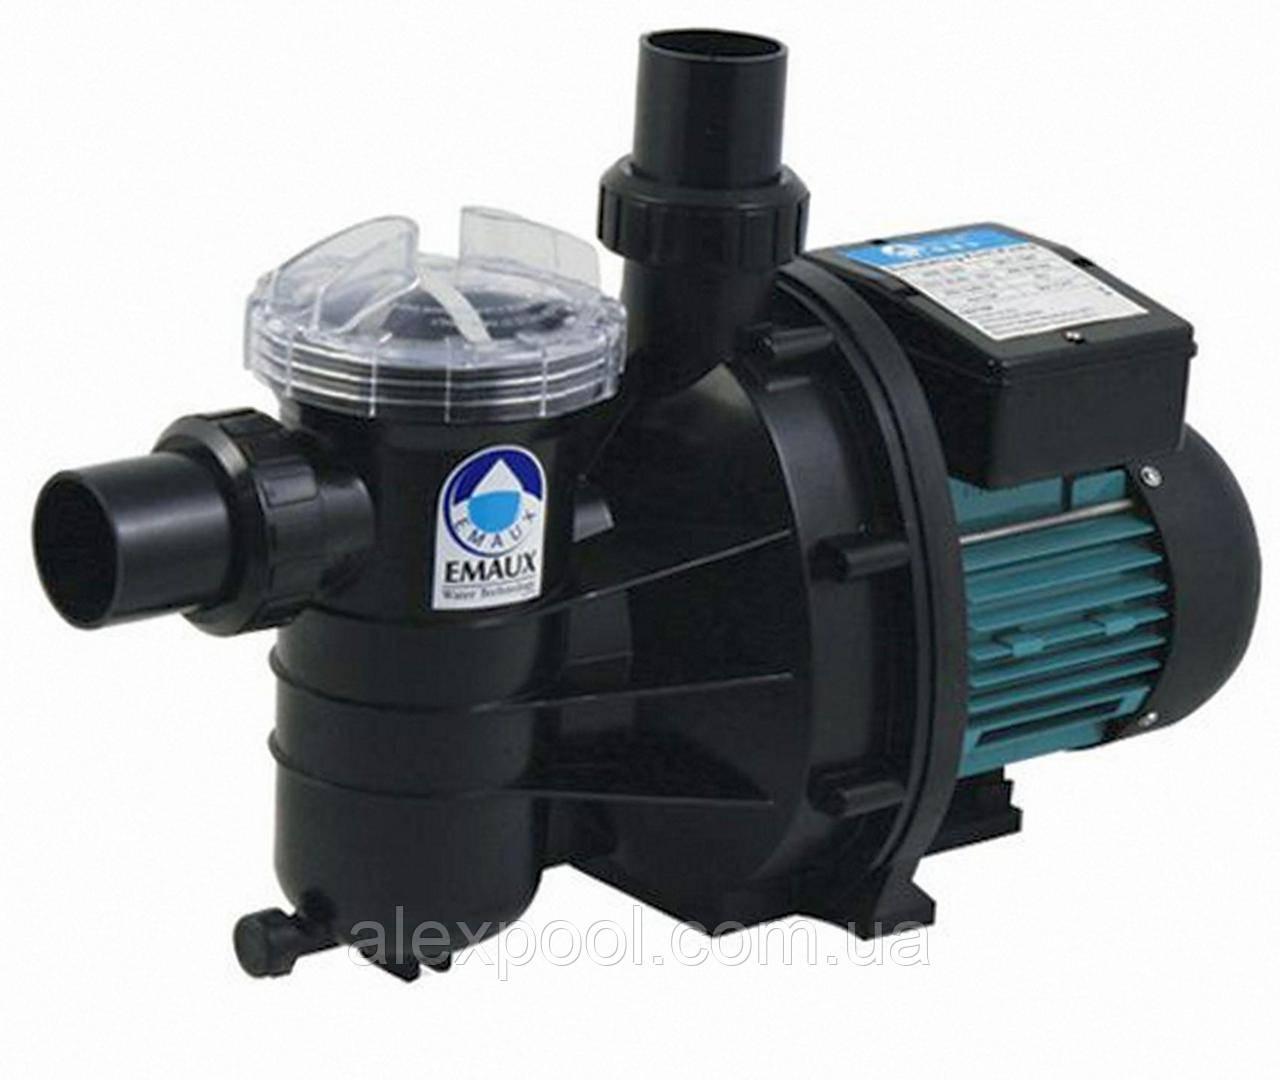 Emaux SS050 Насос для басейнів ( SS 050, 11 м. куб/год, 0,55 кВт, 0,5 HP, 220В )